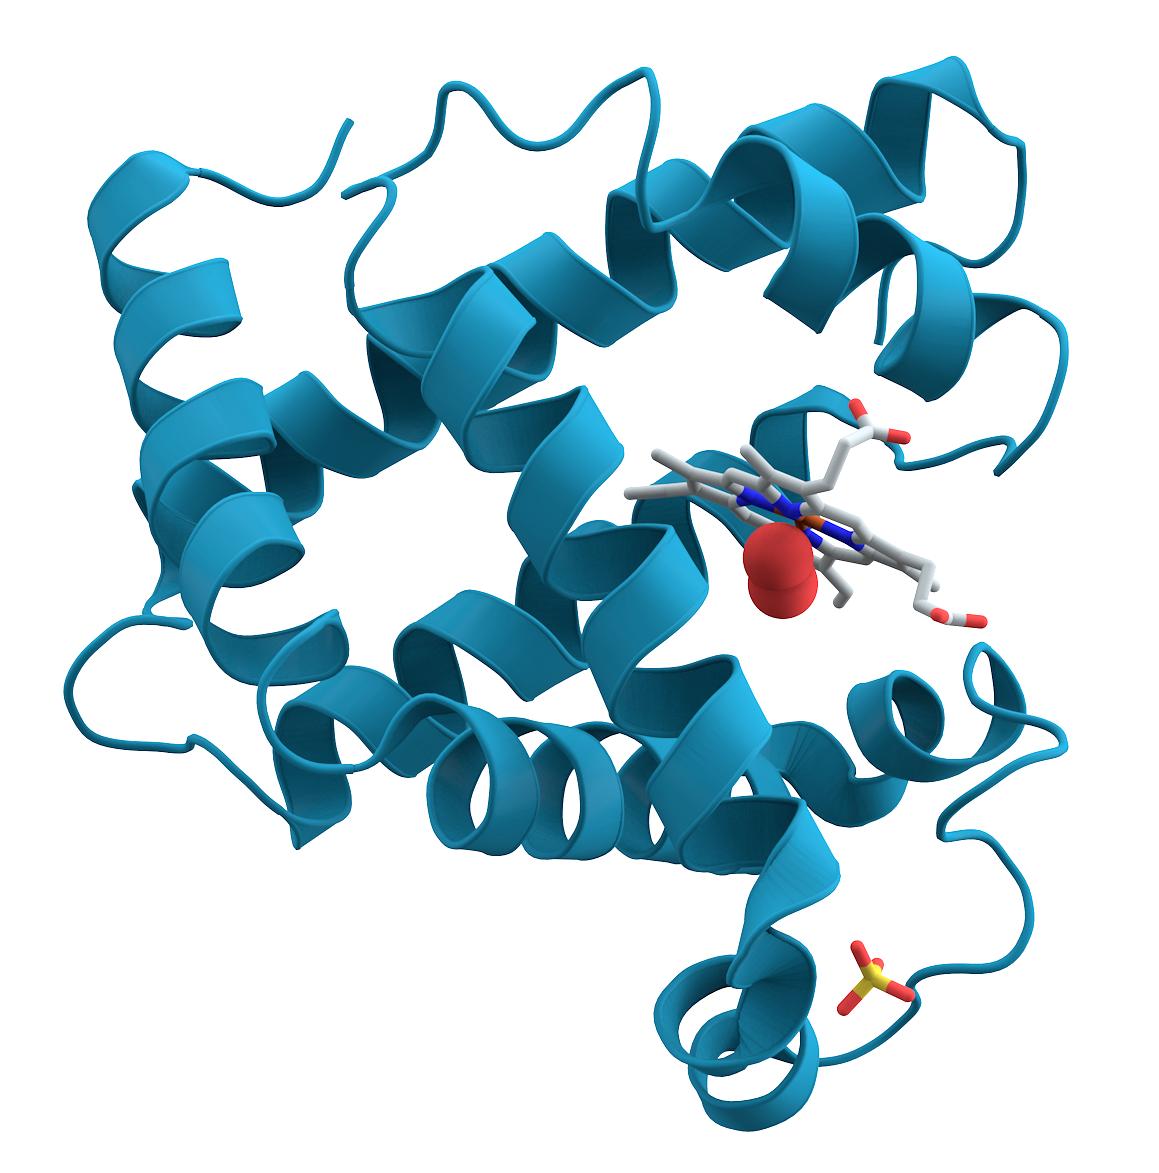 amino-acid-complex-protein